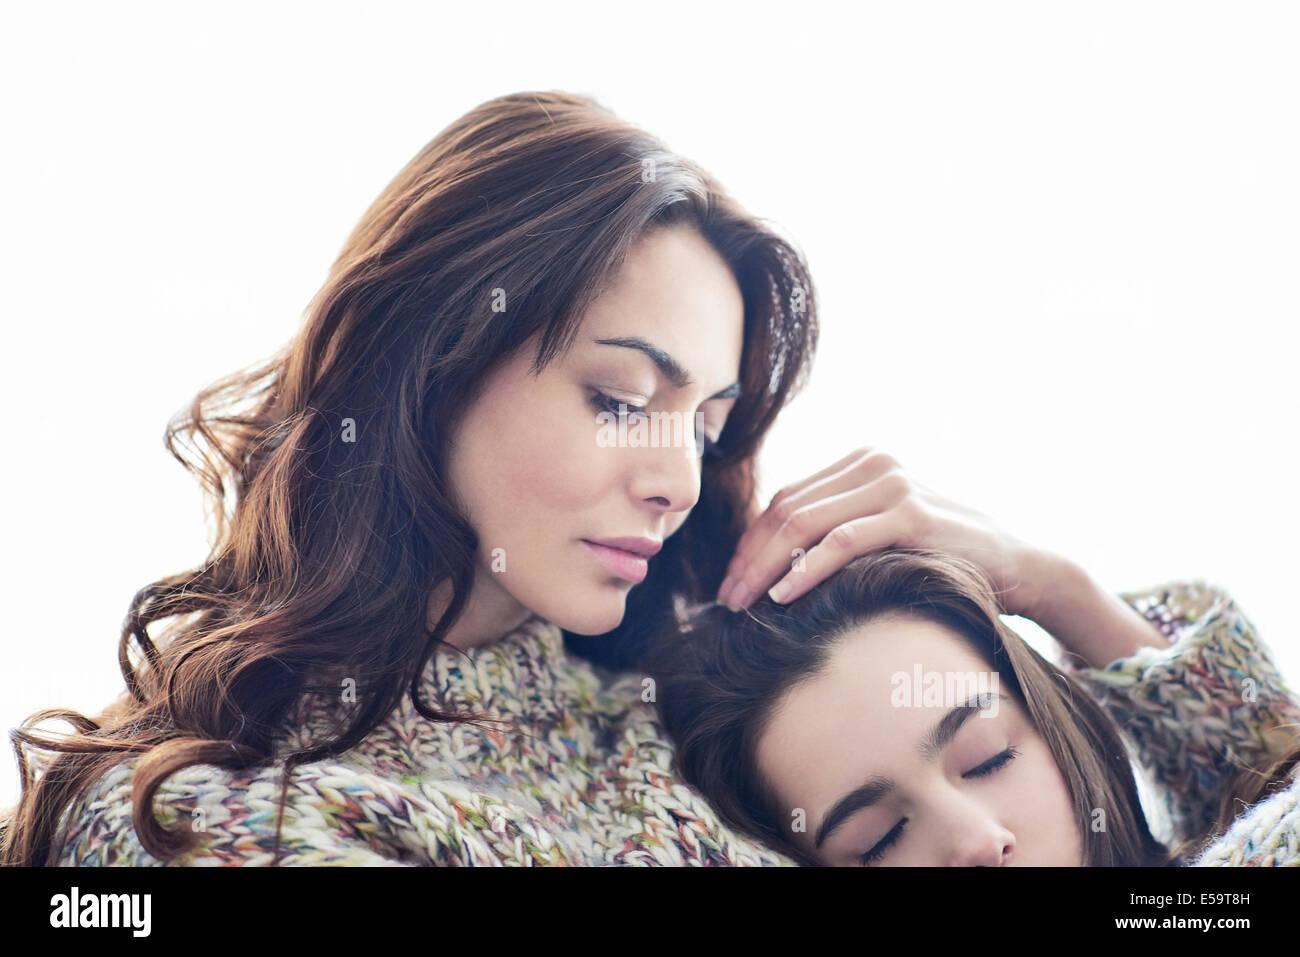 Abrazarse madre hijo Imagen De Stock